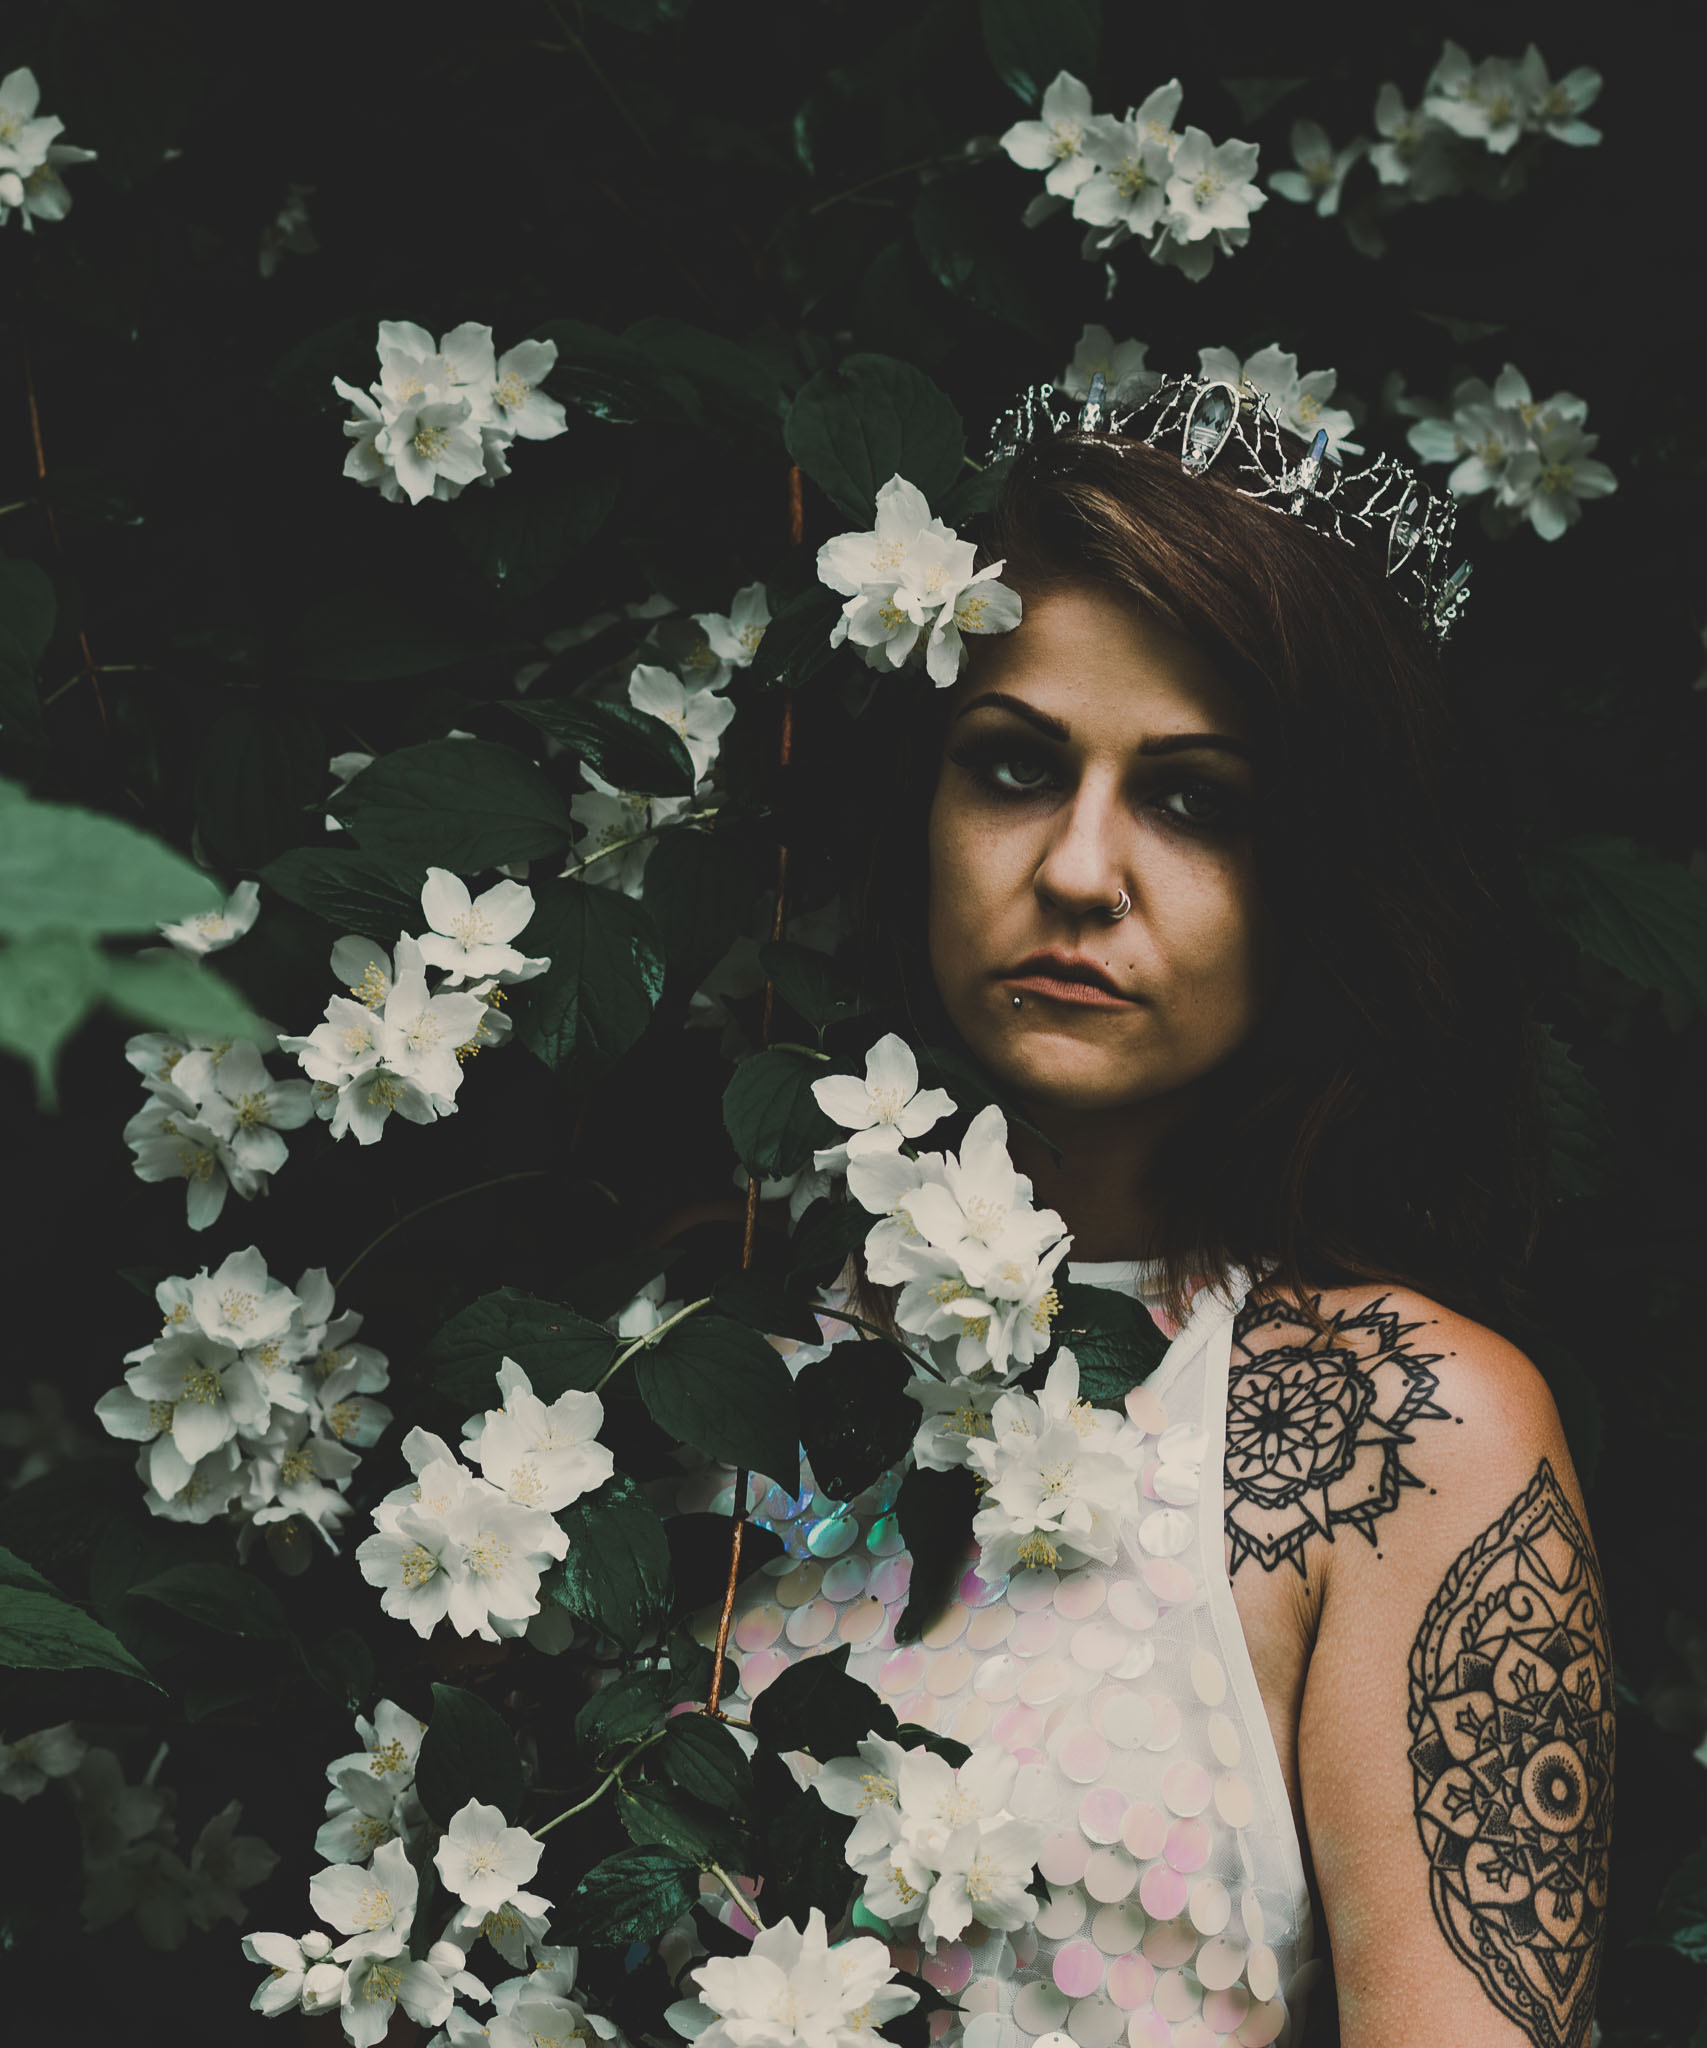 boho-free-spirited-bride-woodland-and-alternative-wedding-photography (16).jpg